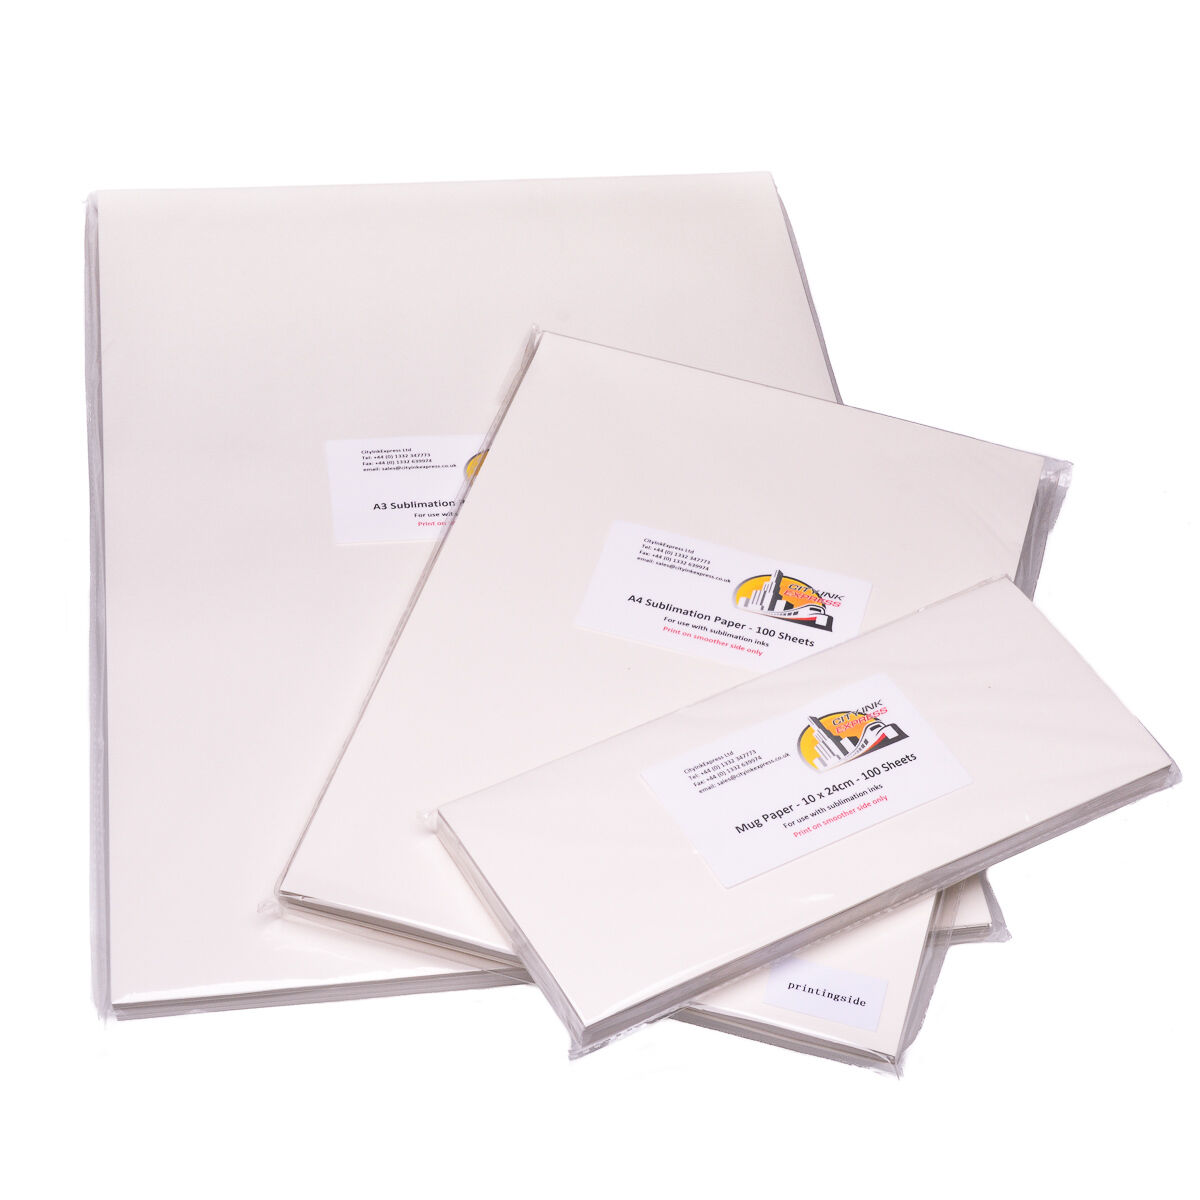 Dye Sublimation Paper for Epson ET-14000 printer